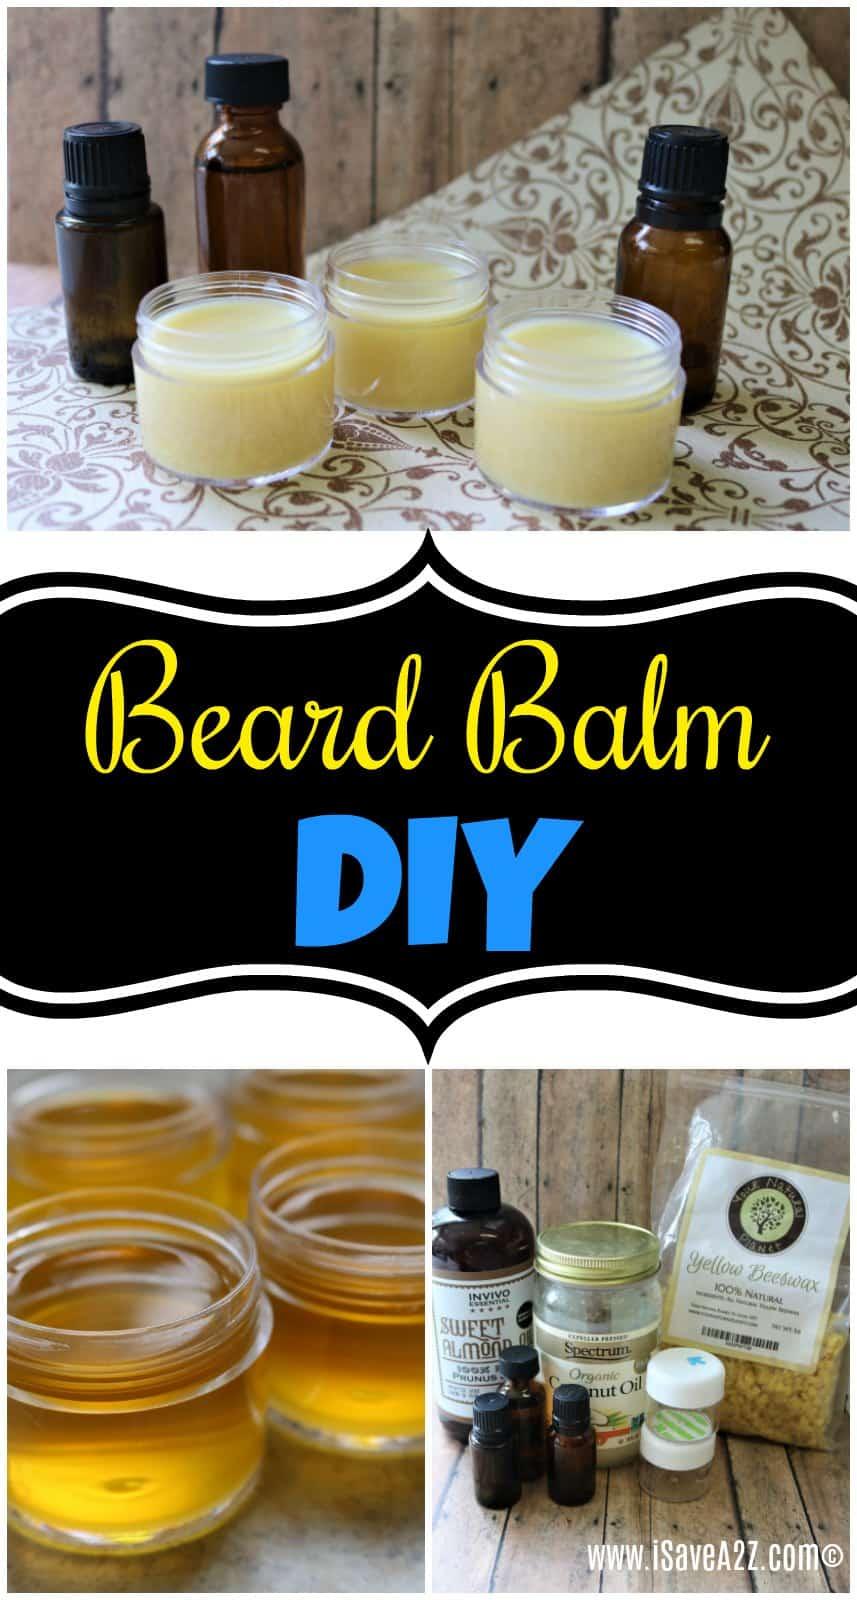 Bear Balm DIY